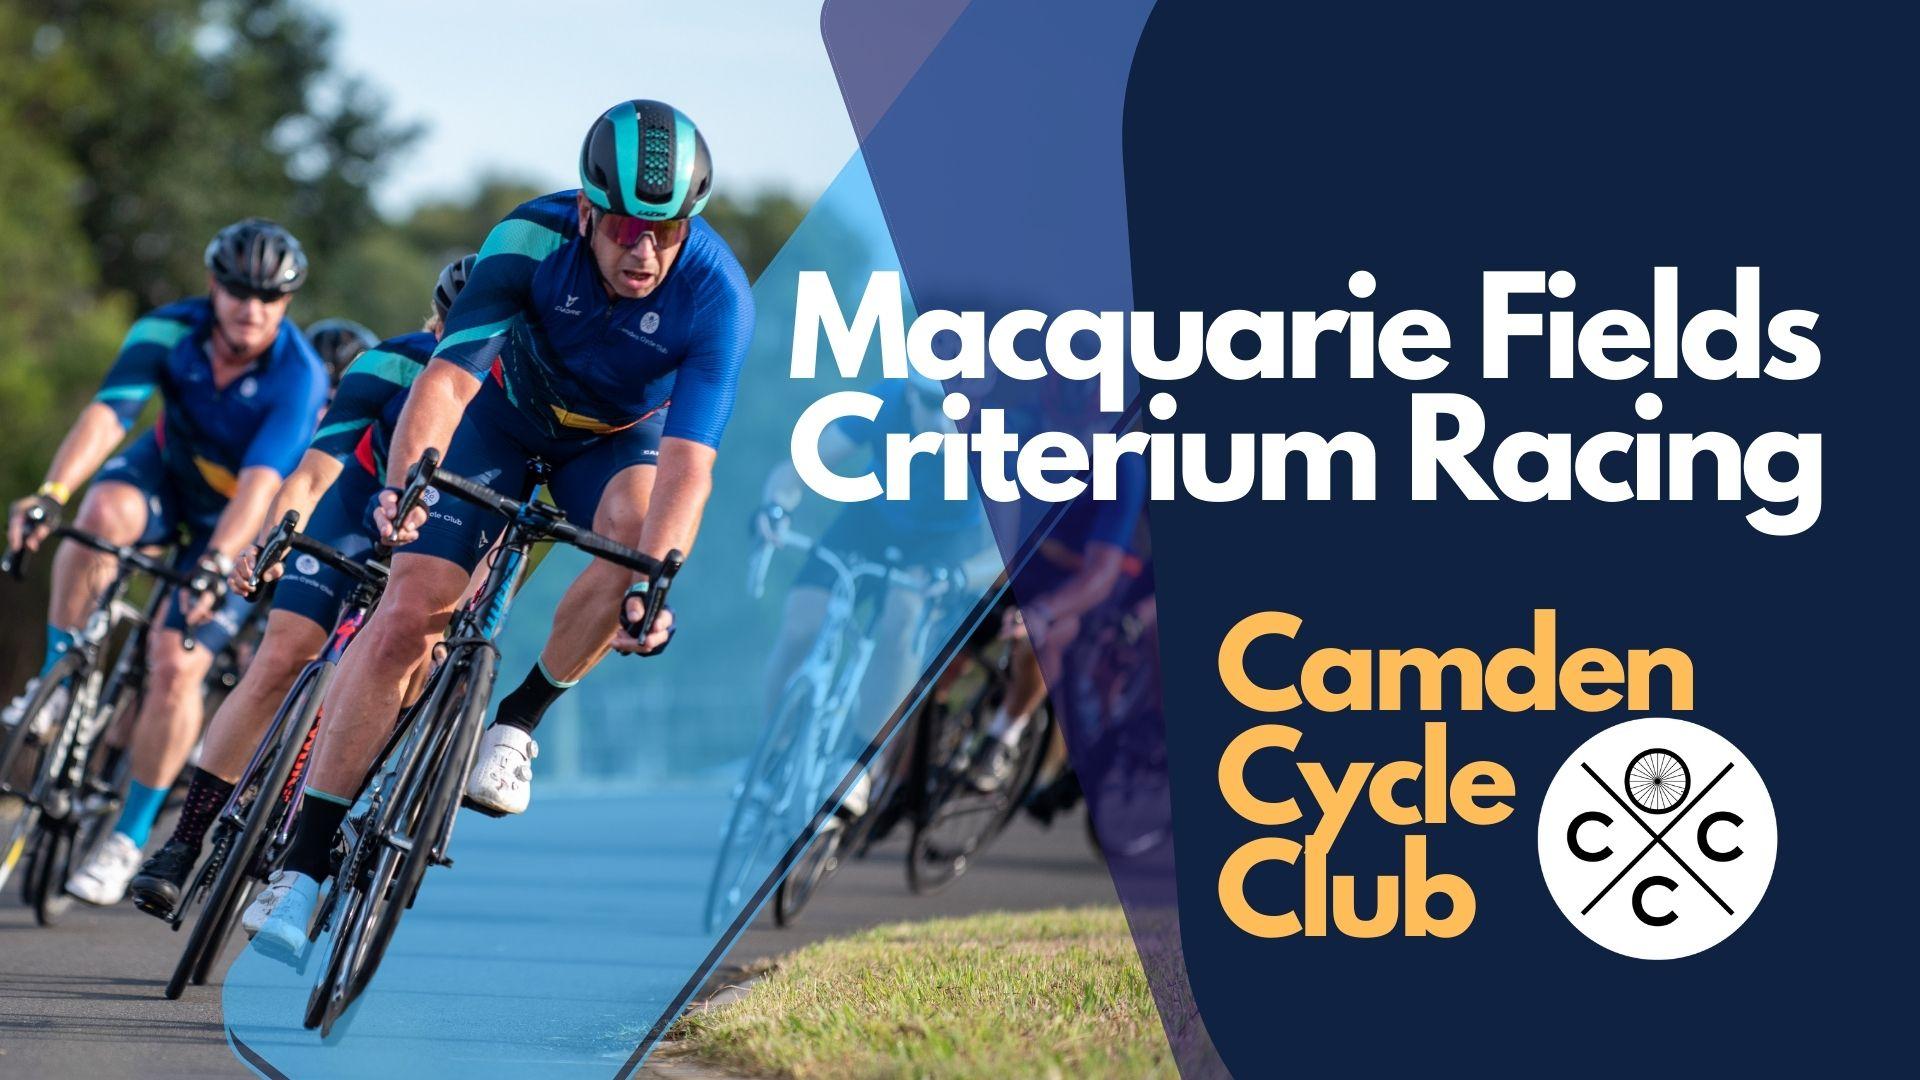 Macquarie Fields Criterium Cycling Race